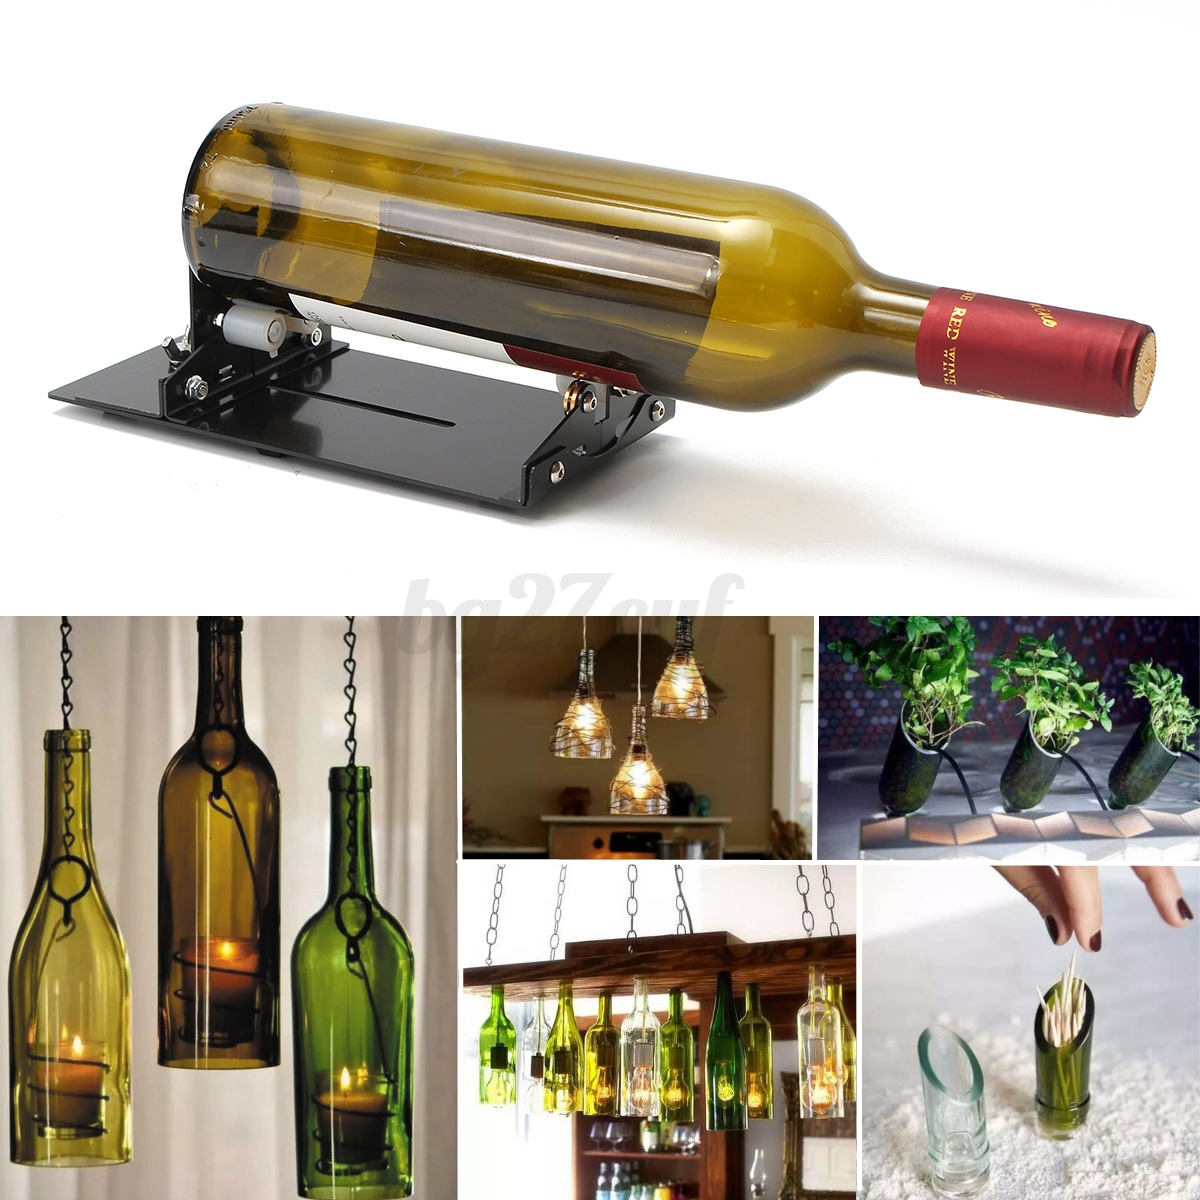 Glass diy bottle cutter wine bottles jar cutting machine for Wine bottle glasses diy